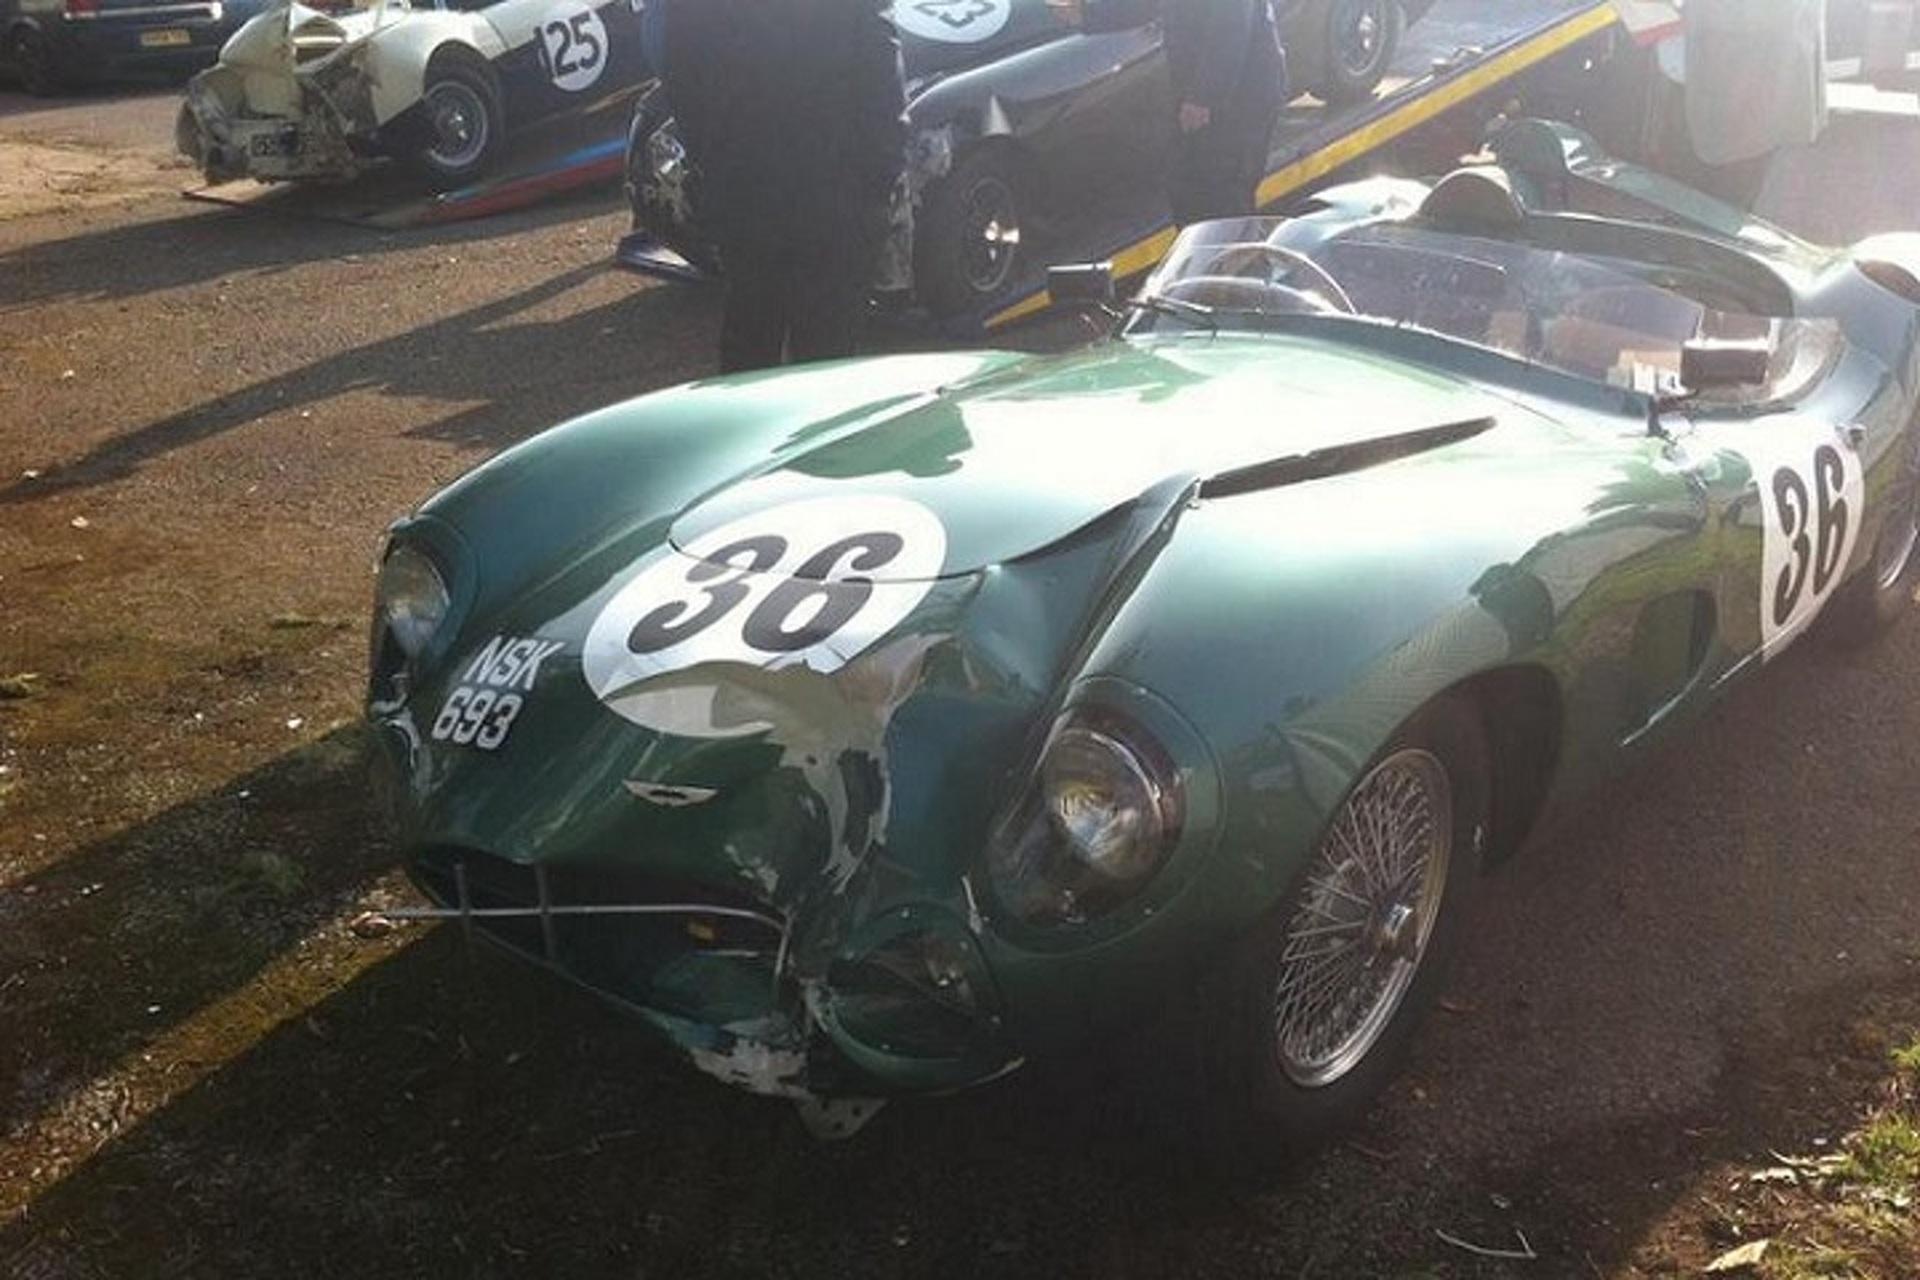 $30 Million Aston Martin DBR1 Wrecked While Racing